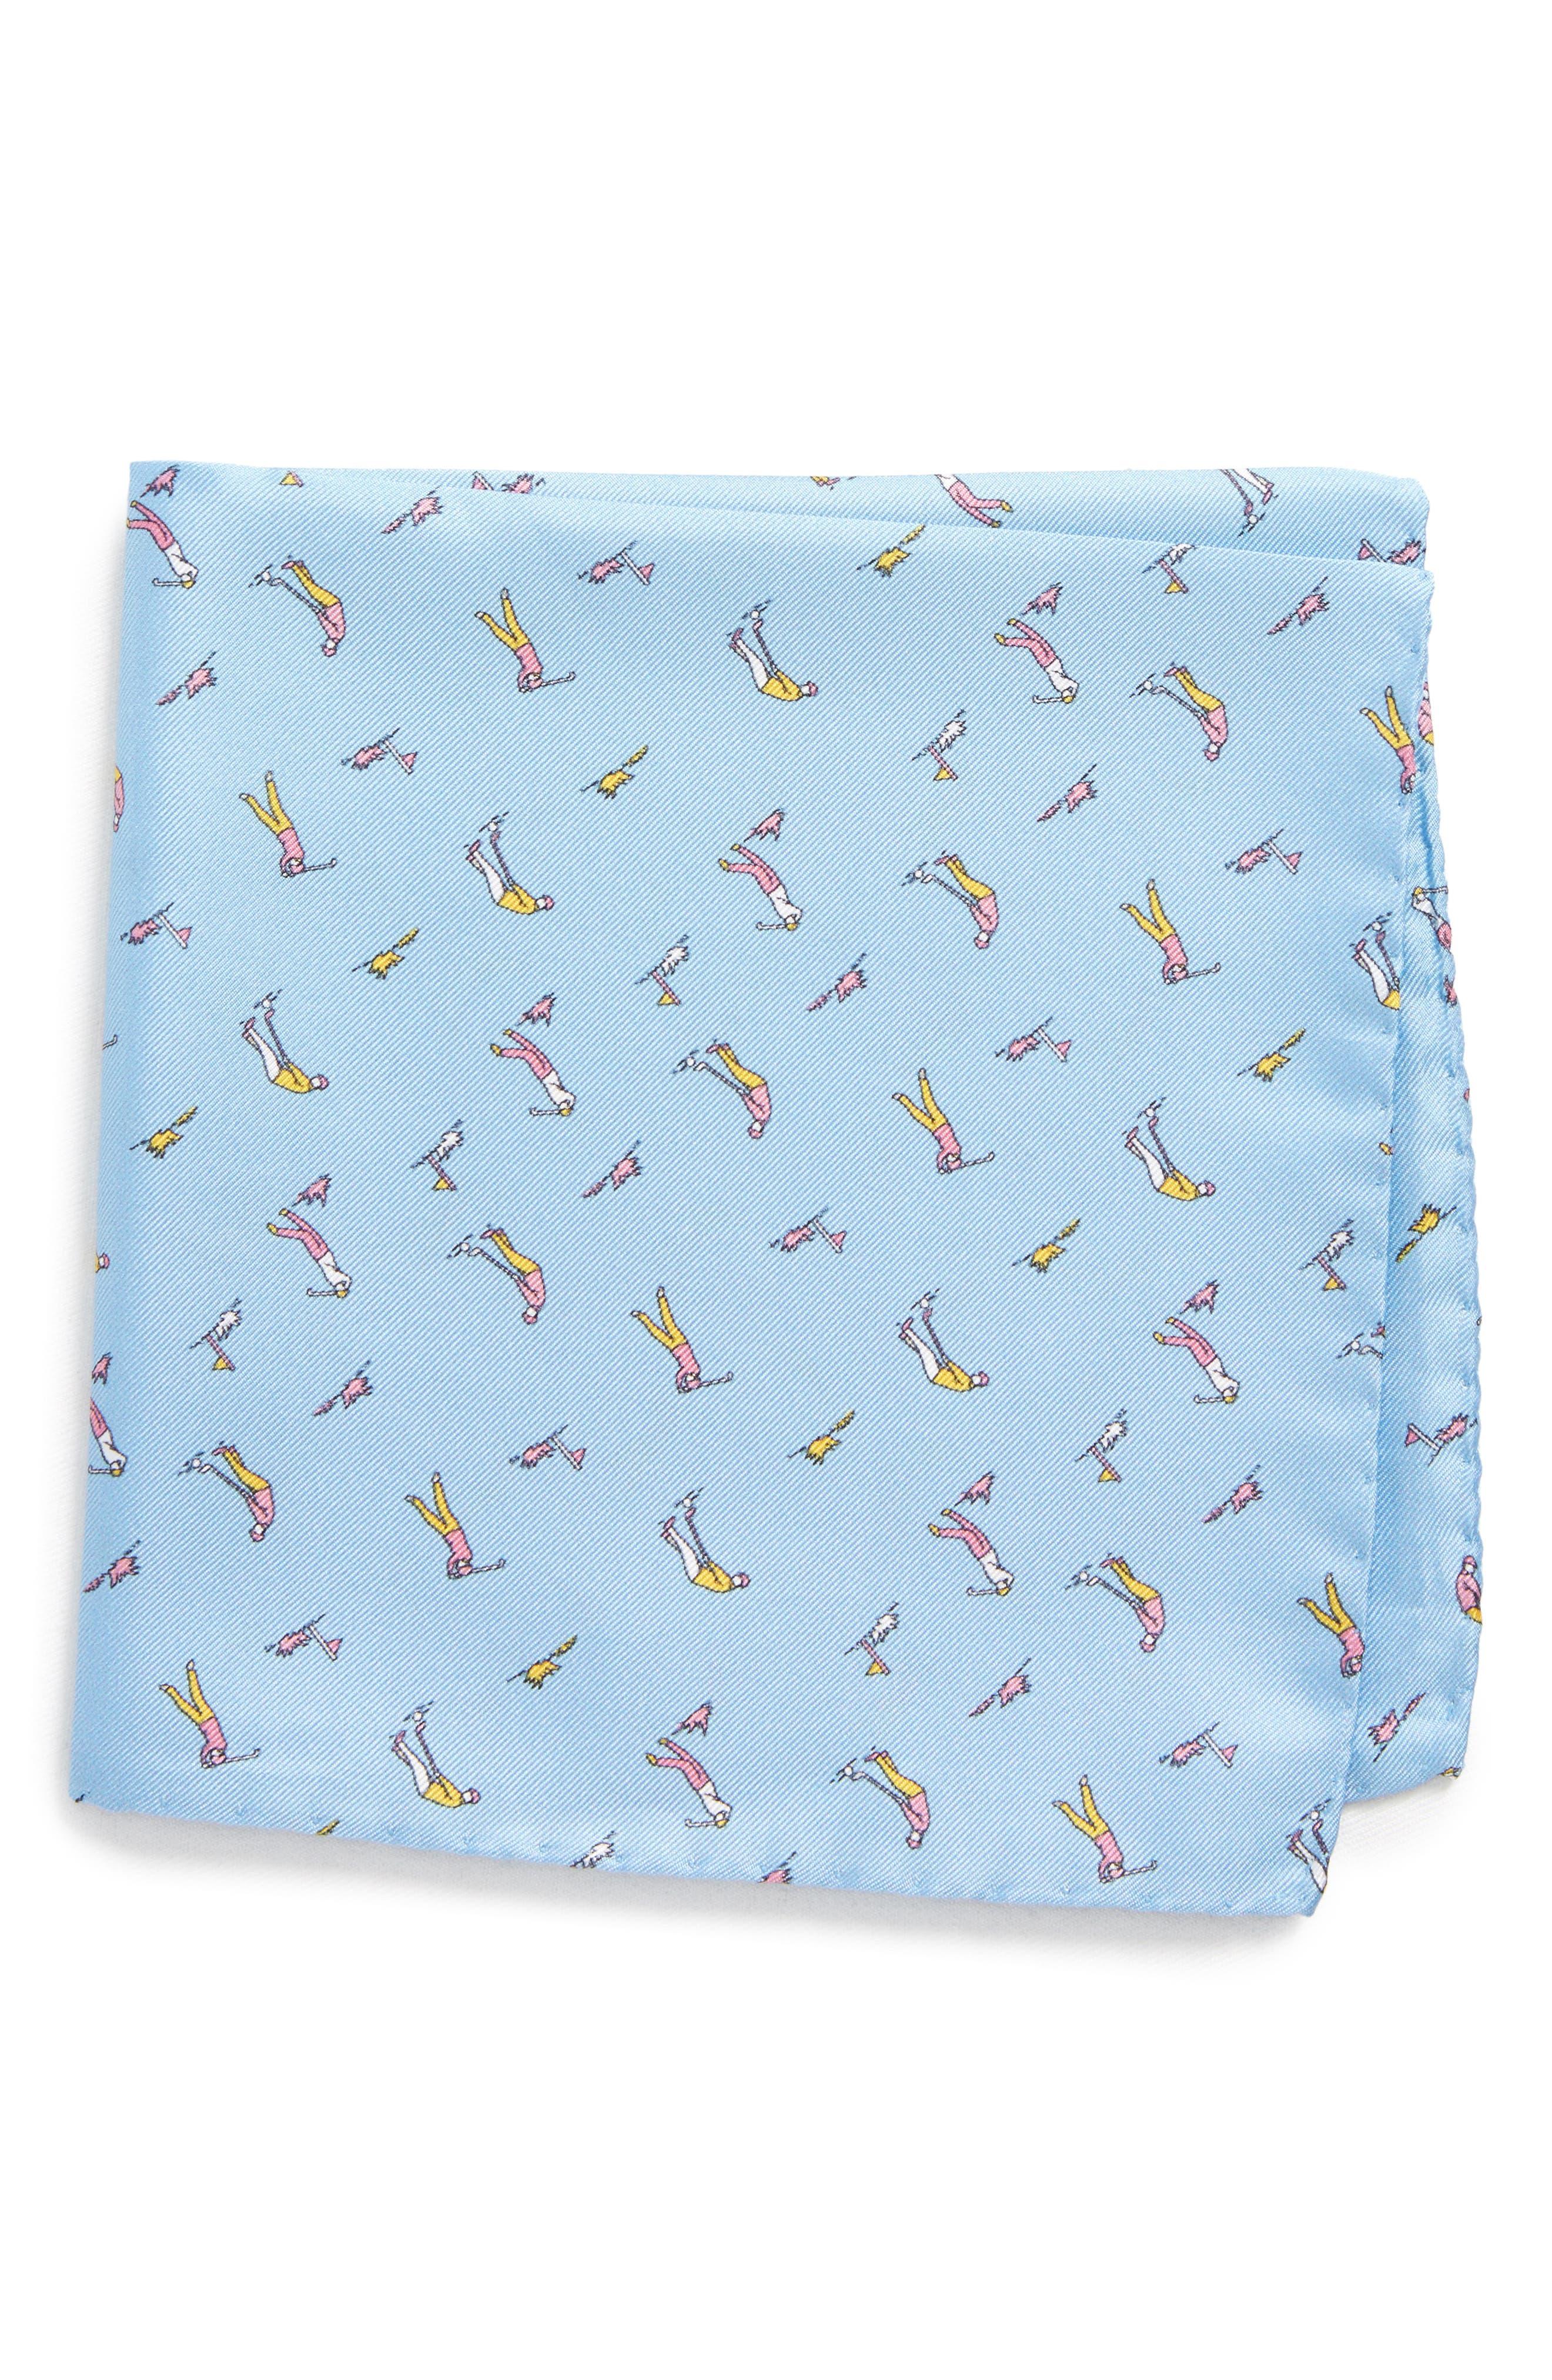 Foreplay Silk Pocket Square,                         Main,                         color, LIGHT BLUE